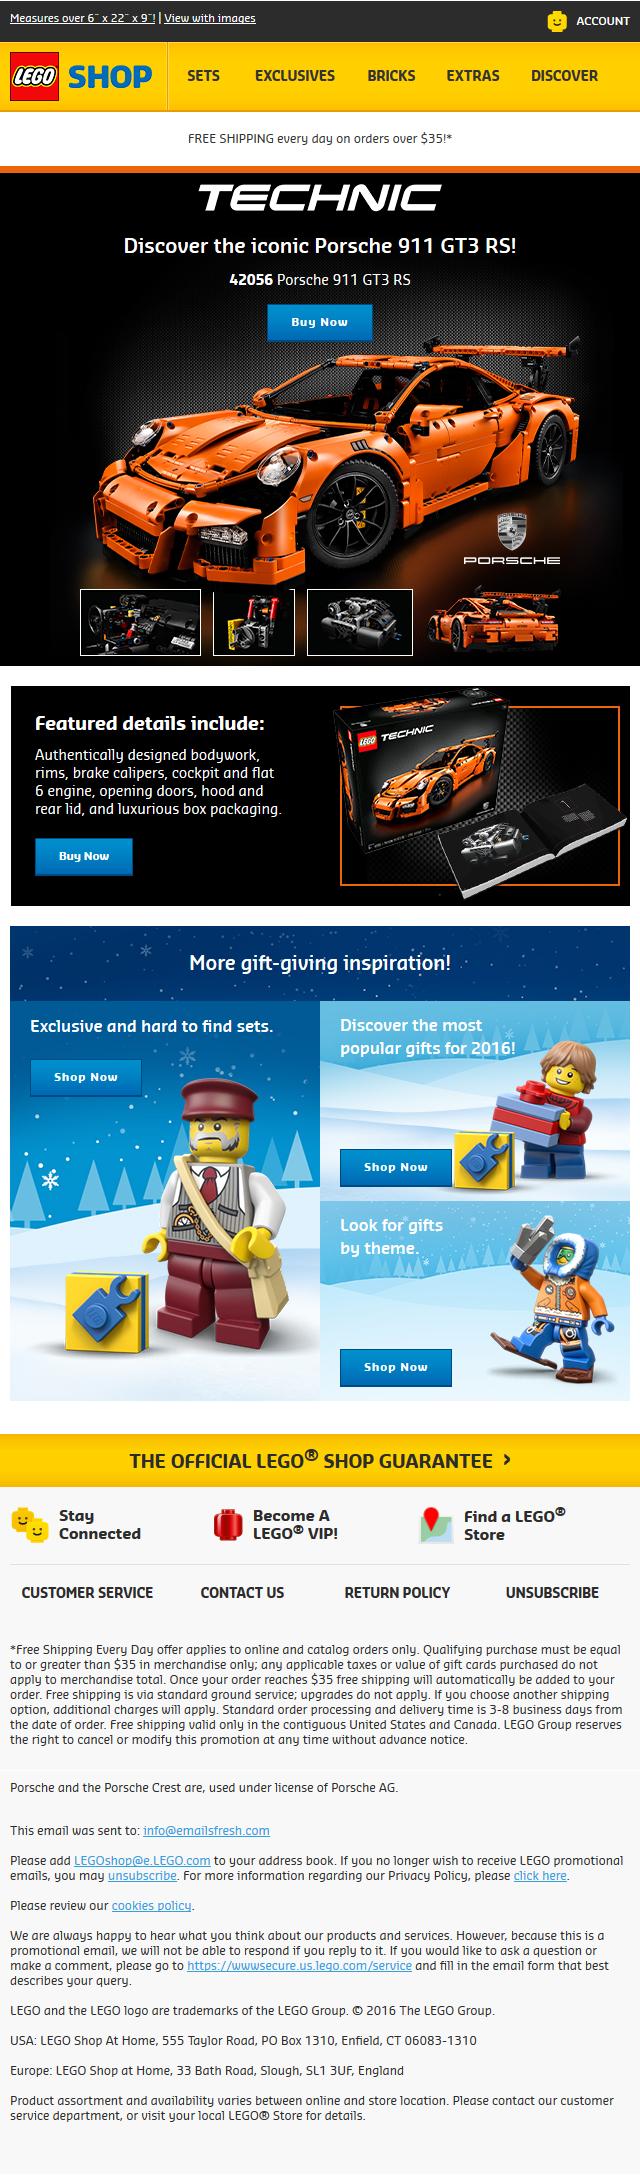 Get the LEGO® Technic Porsche; now in stock!